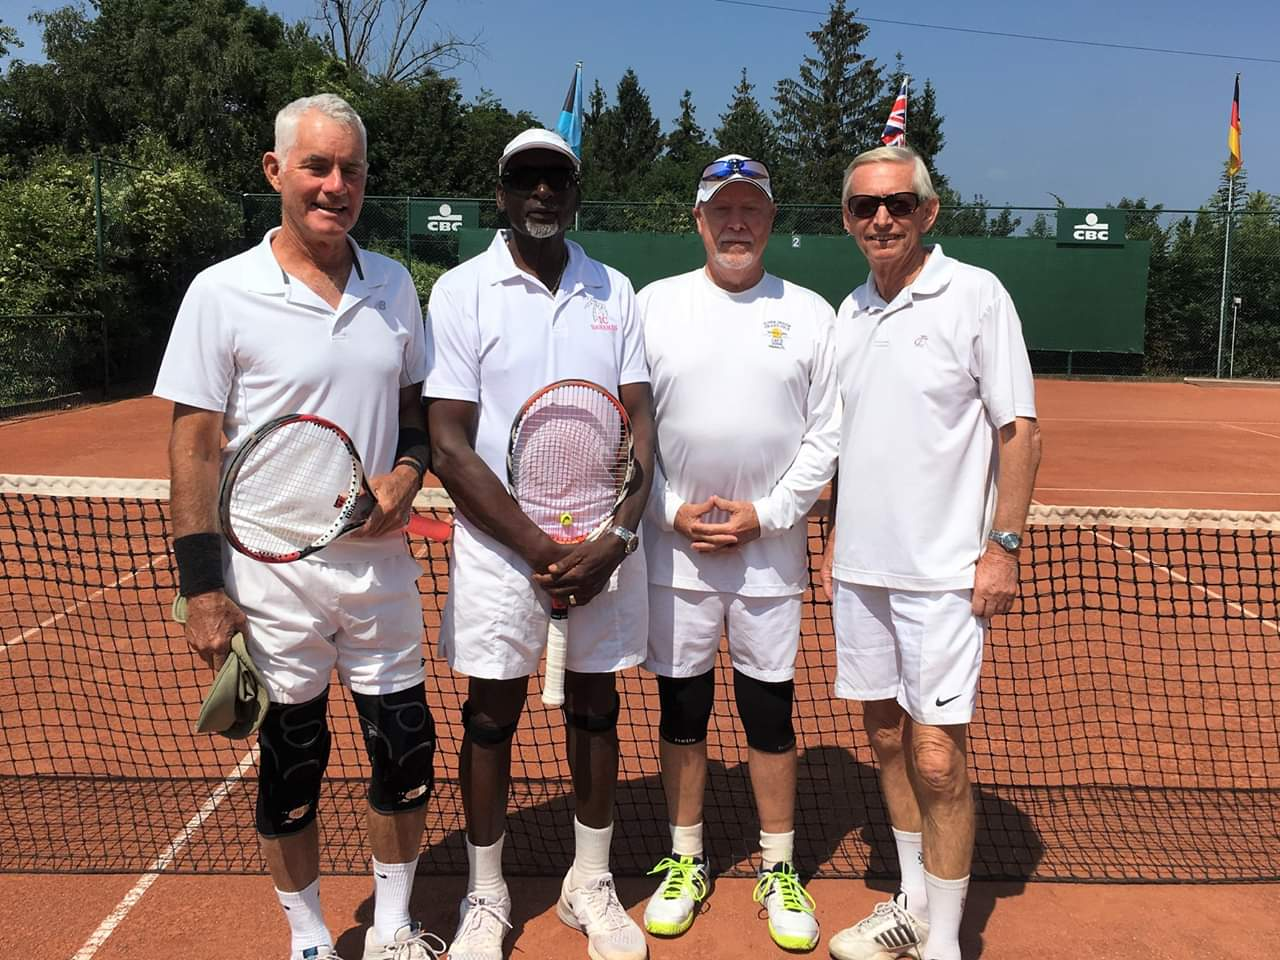 Kit Spencer leads IC Caribbean Team in Belgium Tennis Tournament